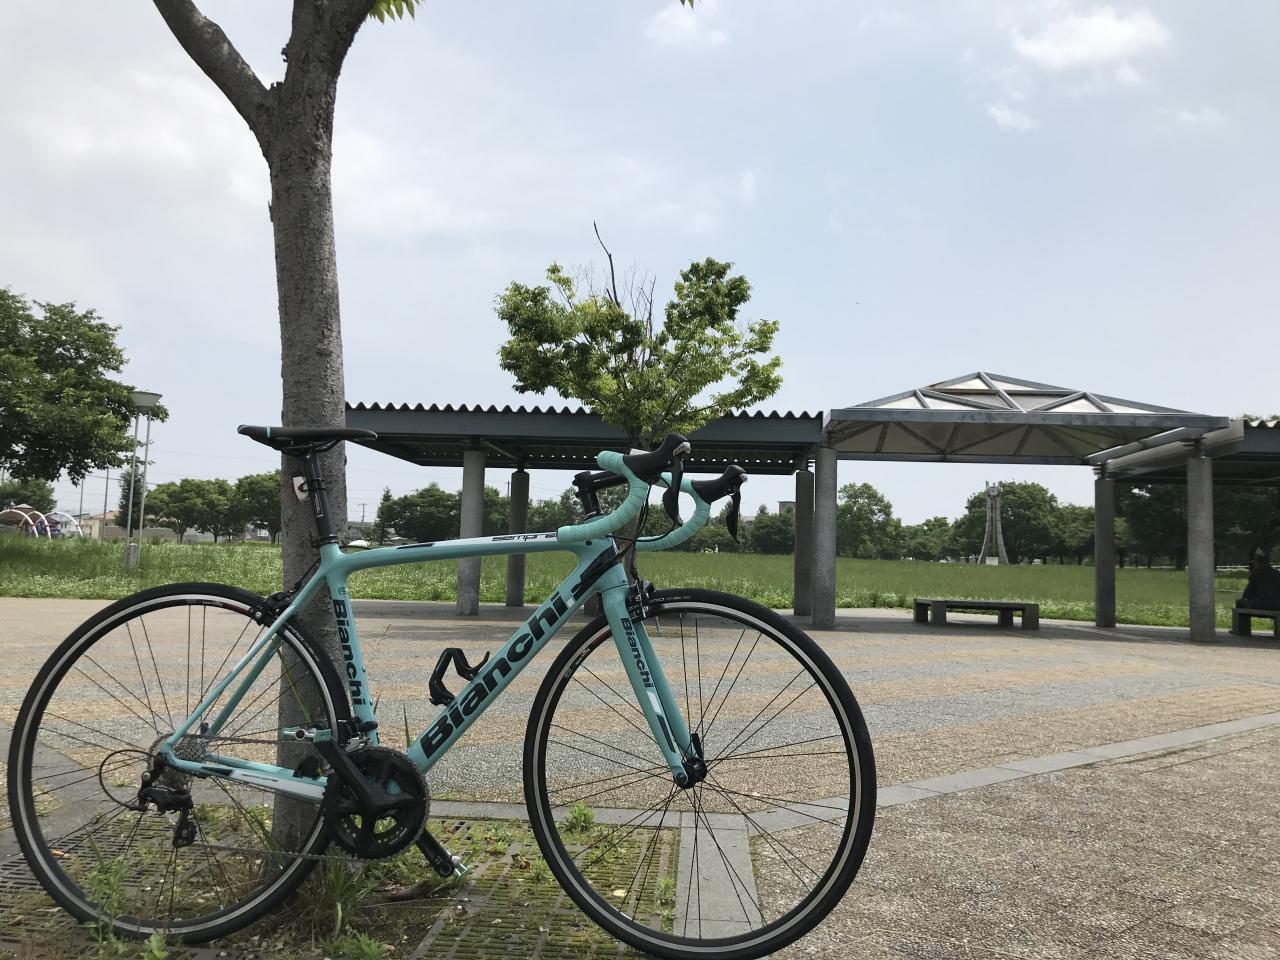 Bianchi SEMPRE納車…fromSさま!